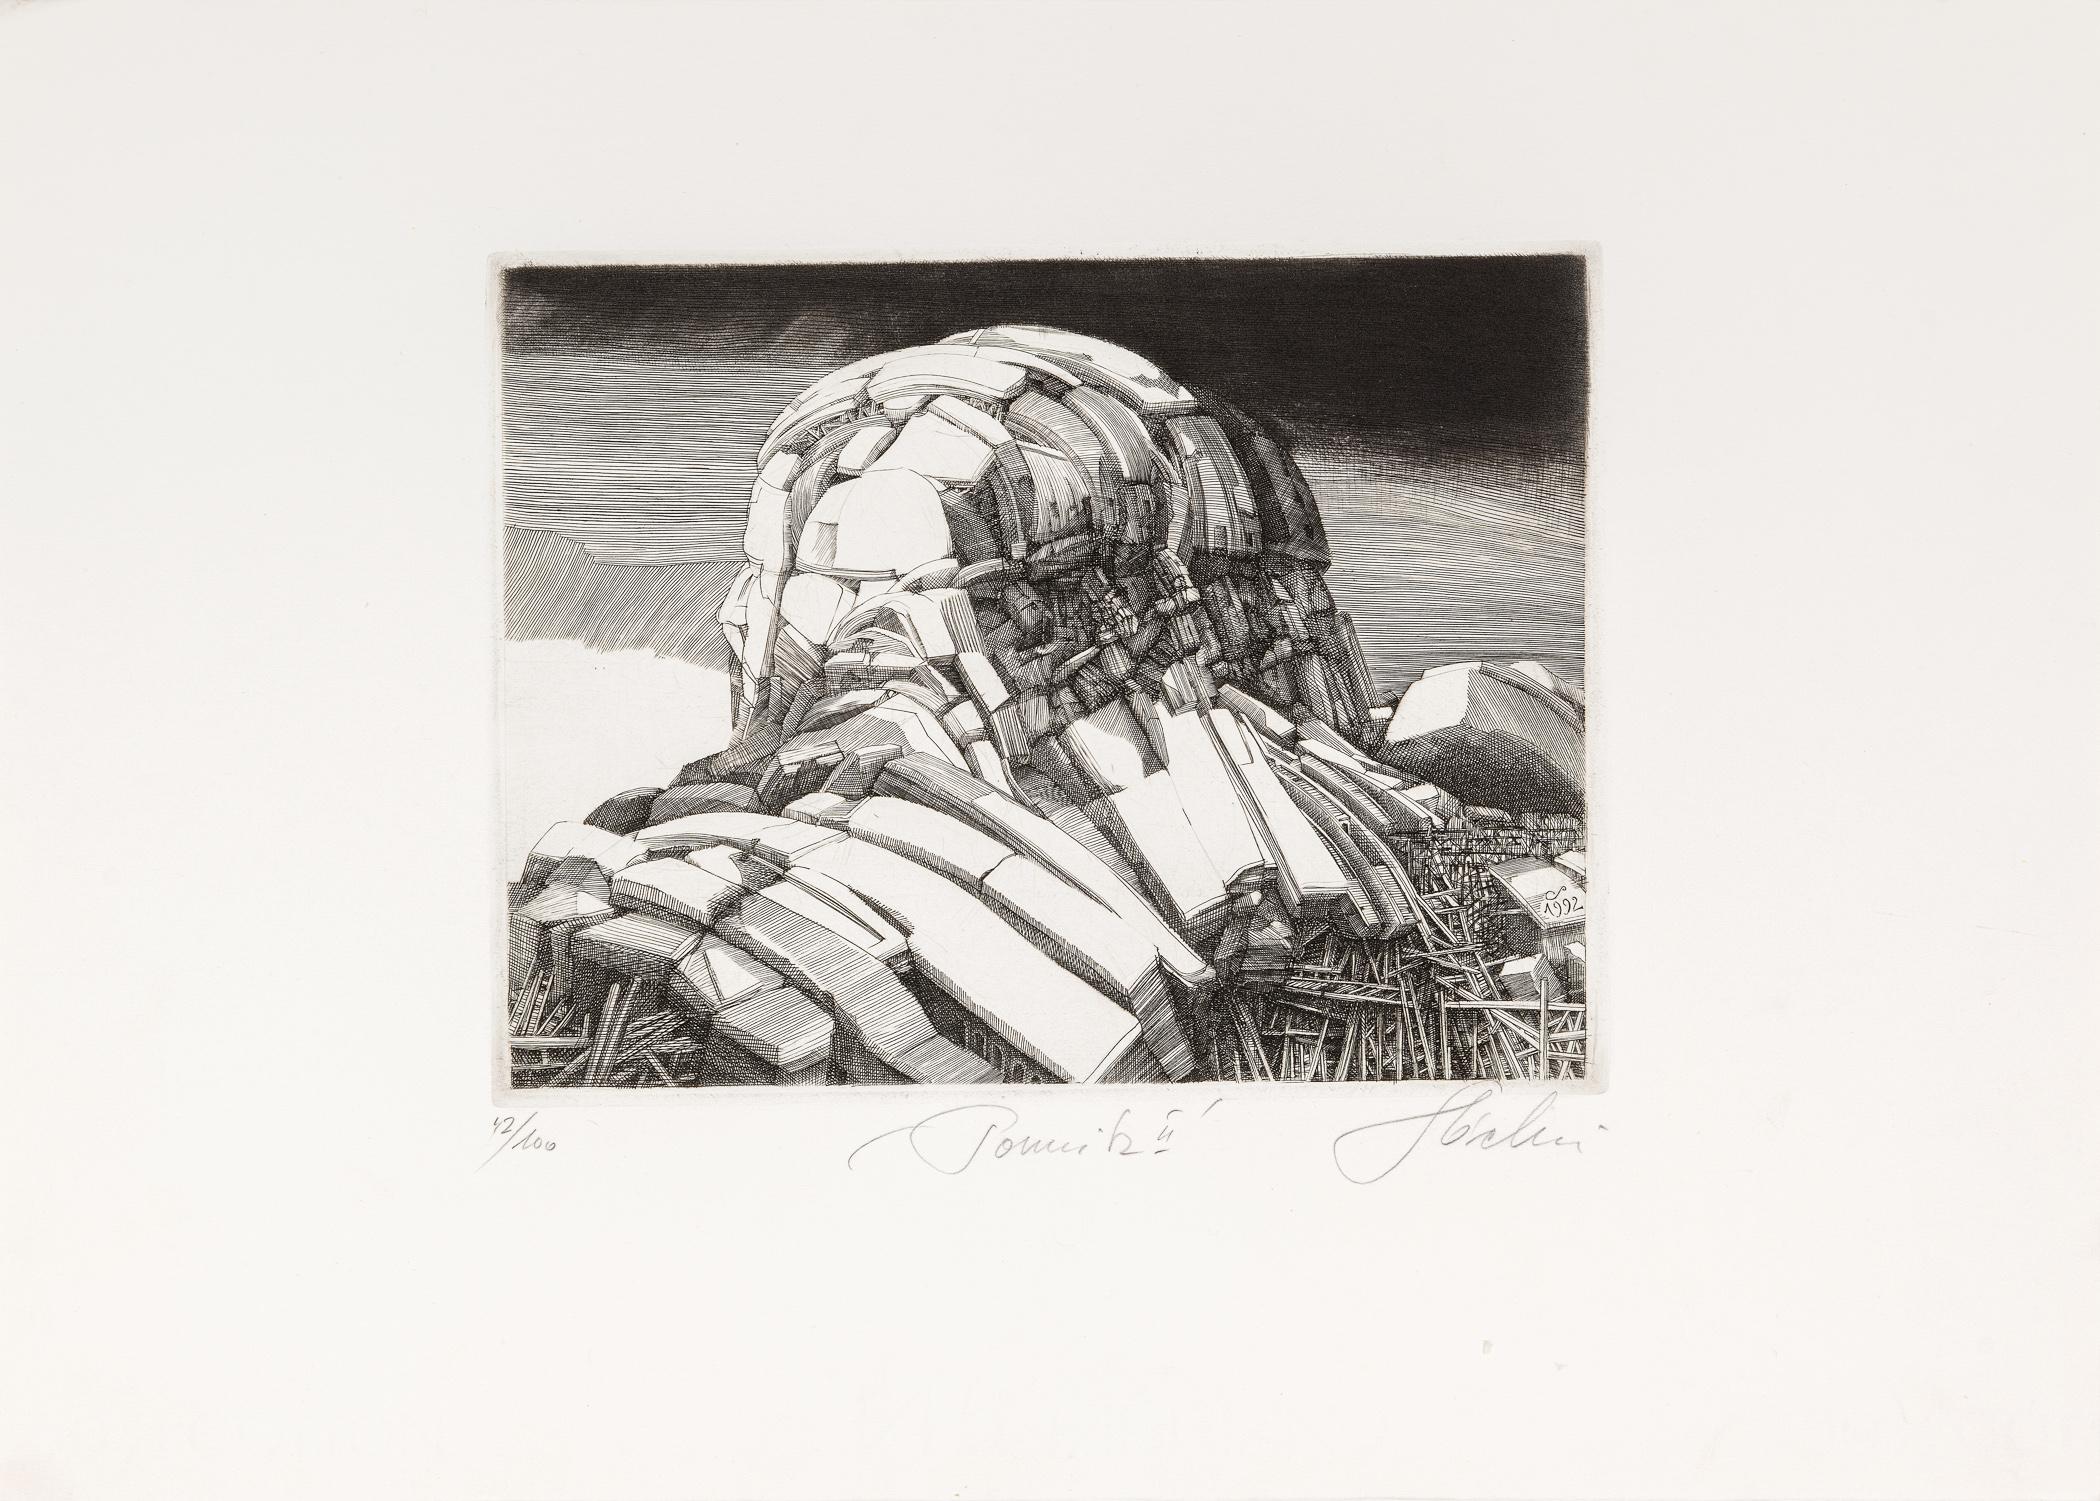 Pomnik II, 1992